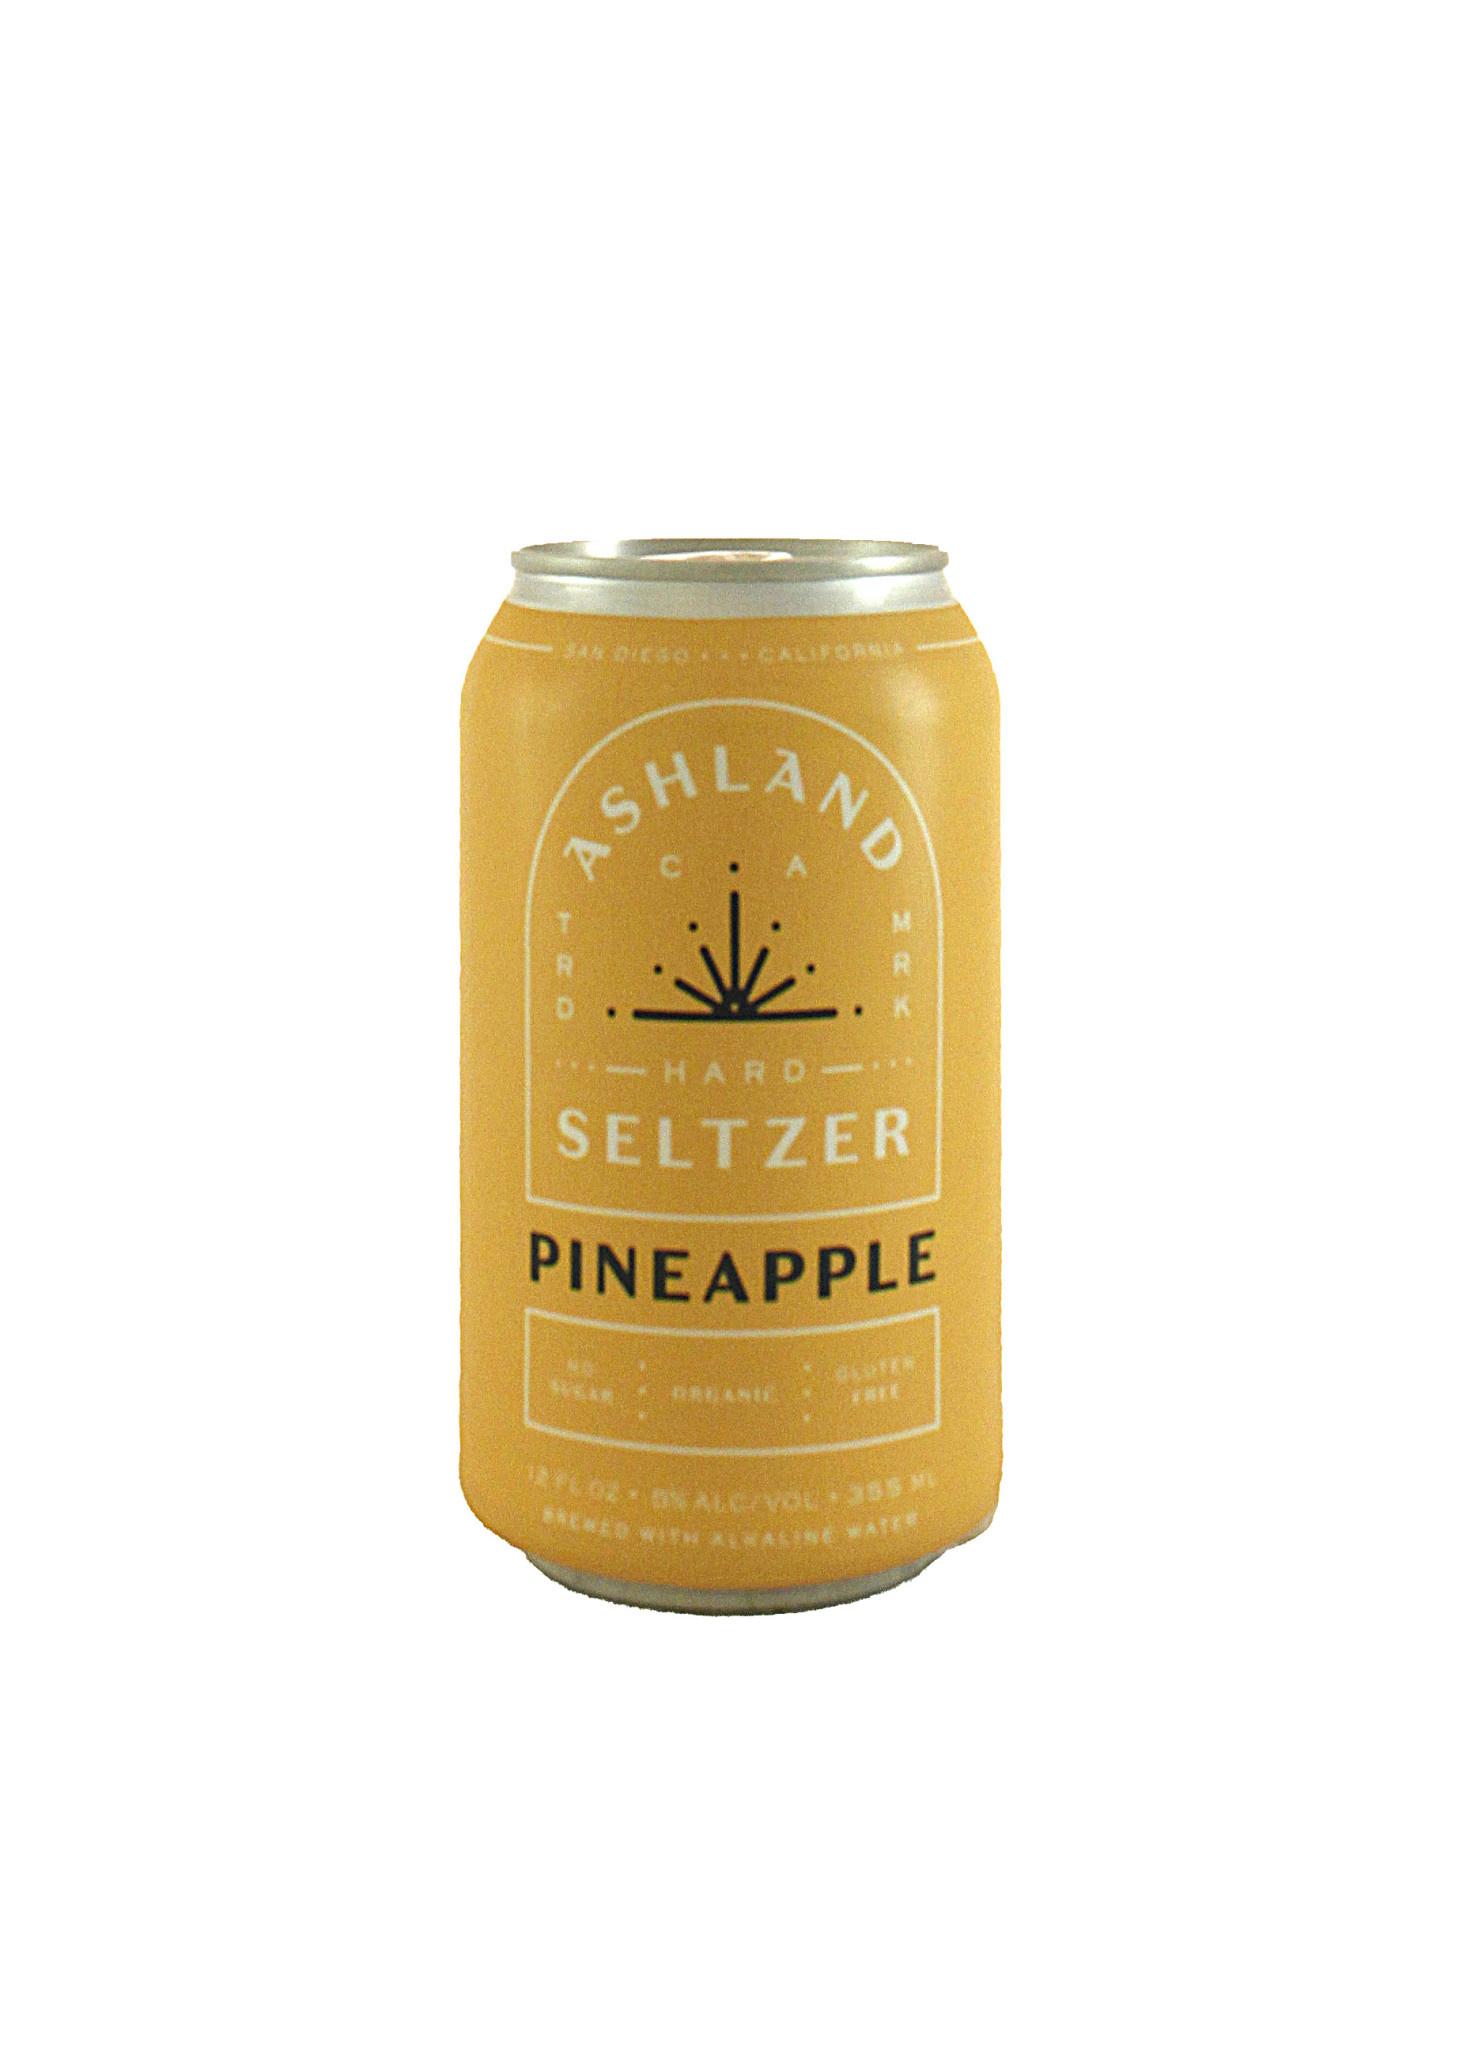 "Ashland Seltzer ""Pineapple"" Pineapple seltzer 12oz can- San Diego, CA"